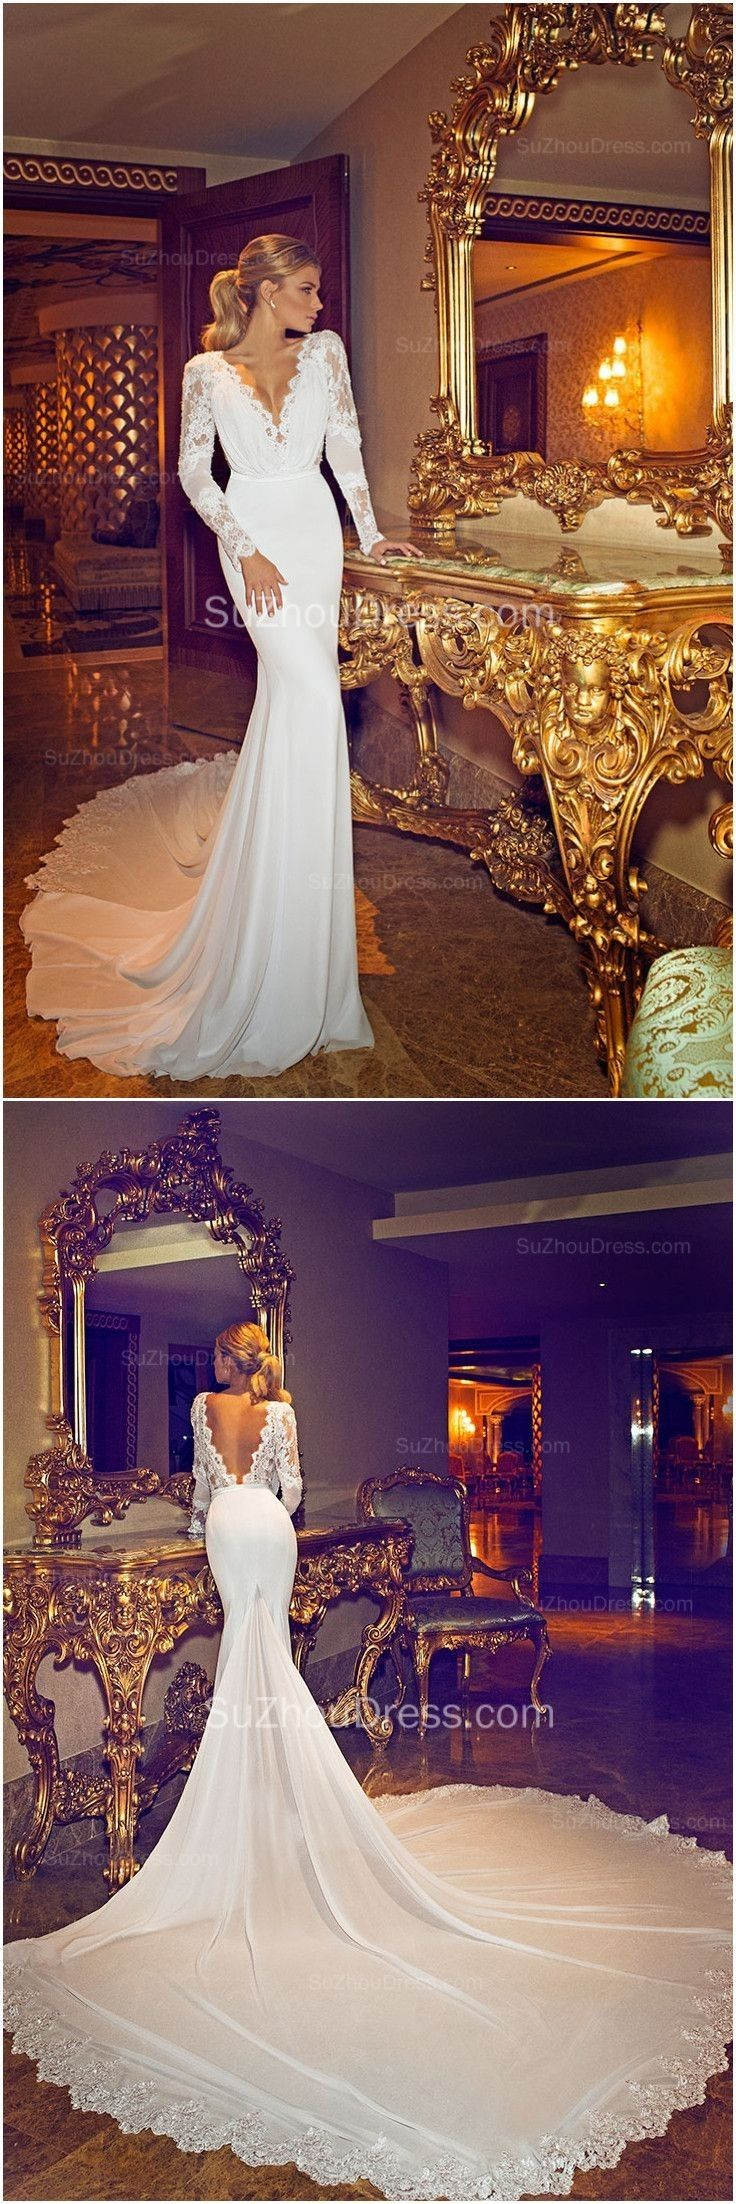 245 mejores imágenes de wedding dress en Pinterest | Bodas, Ideas ...